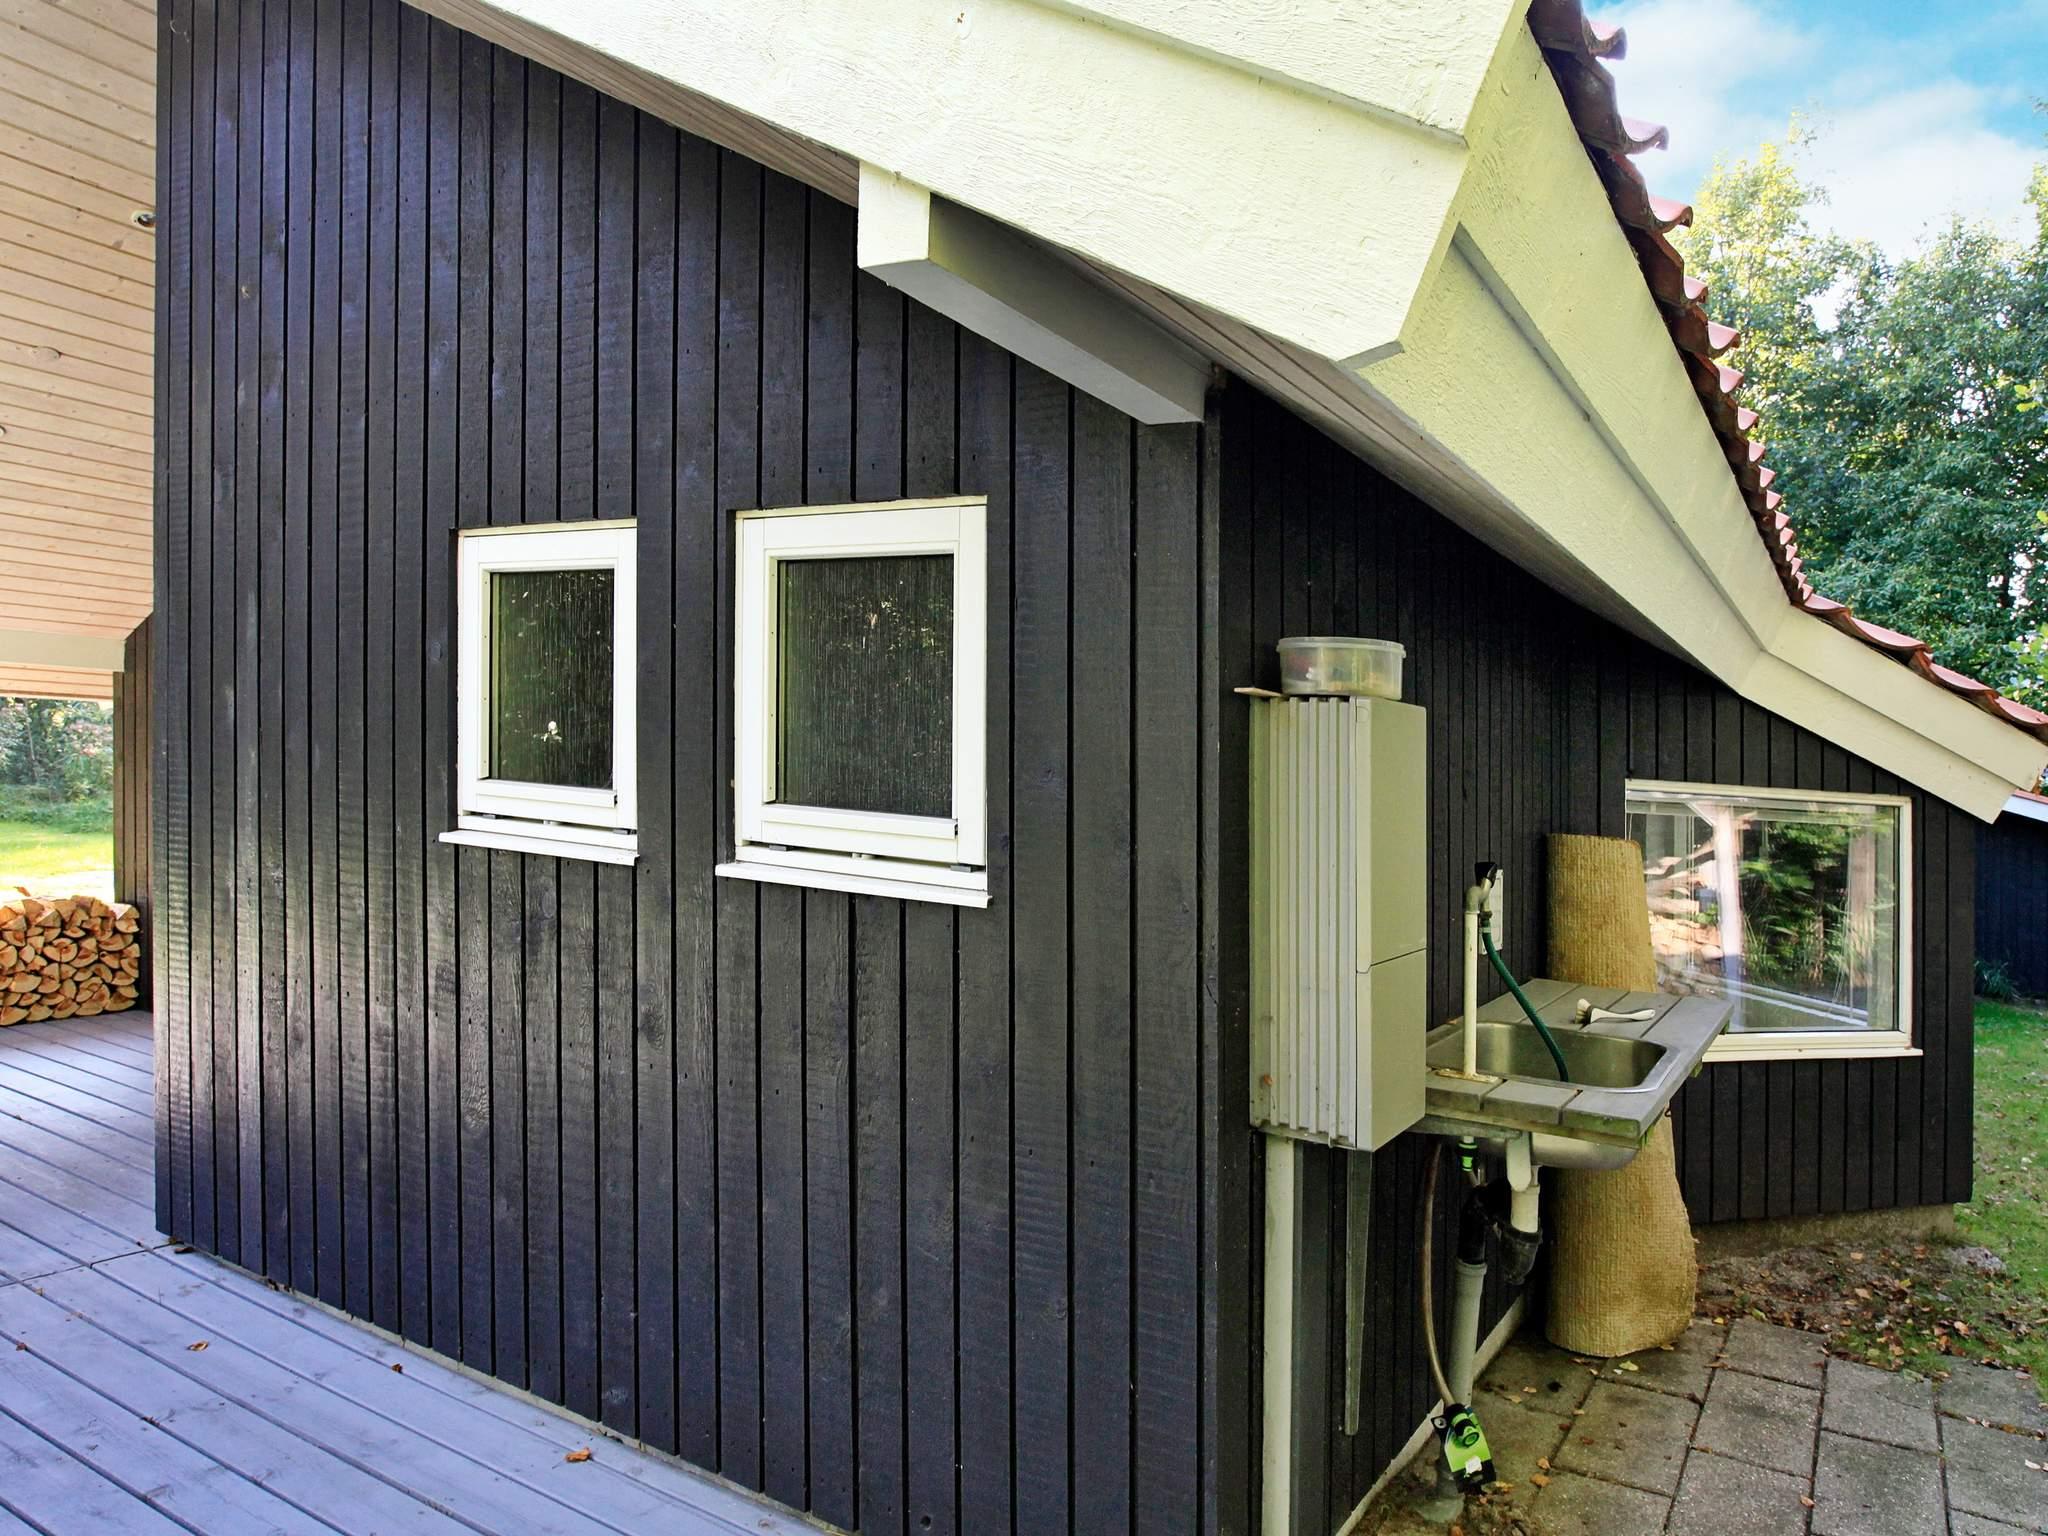 Ferienhaus Ristinge (160040), Ristinge, , Langeland, Dänemark, Bild 23